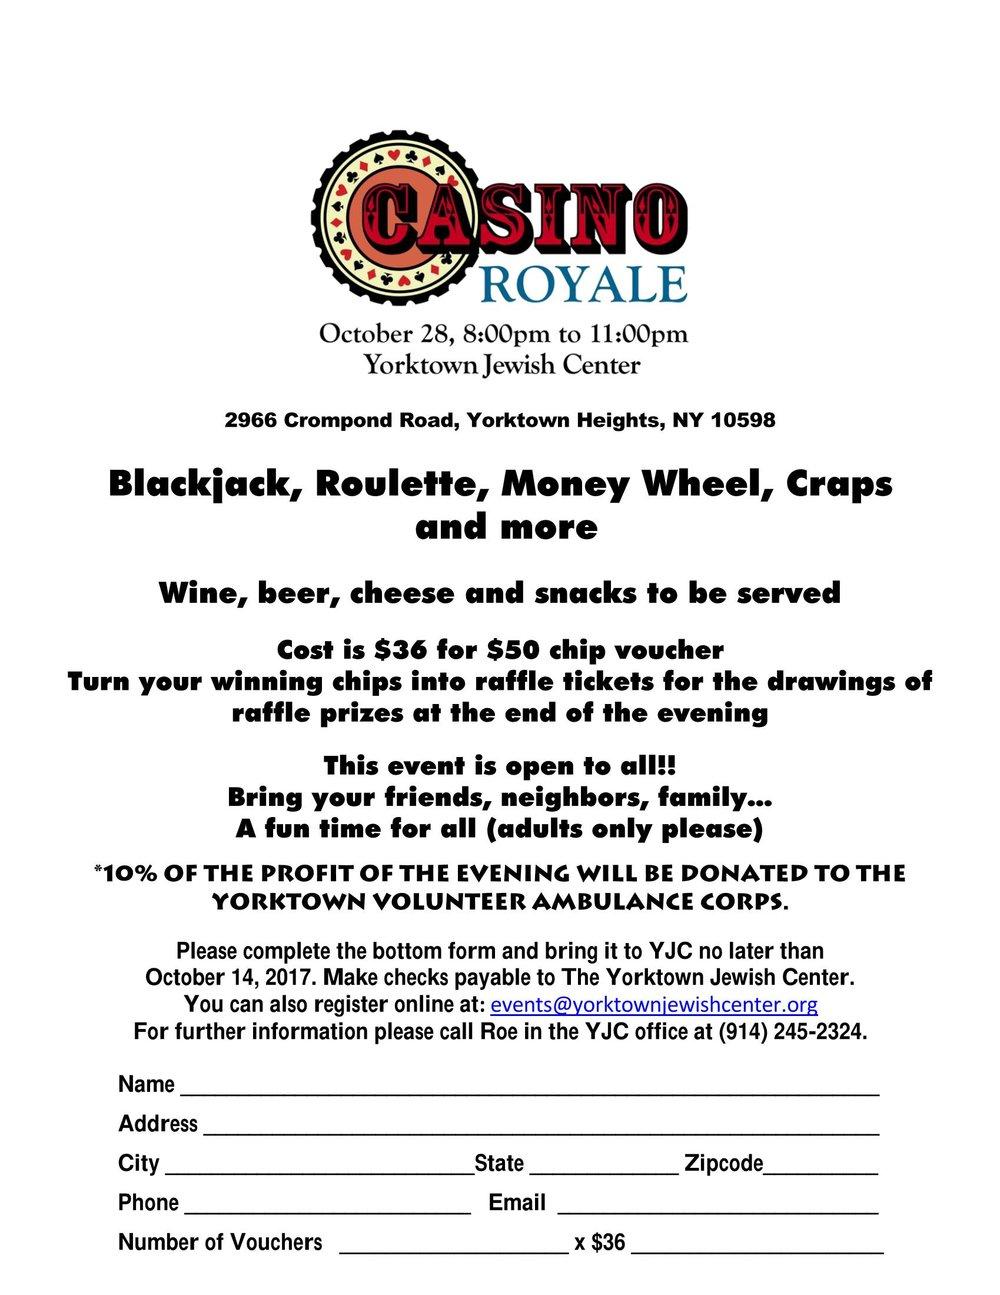 Casino Royale Event Registration Form.jpeg